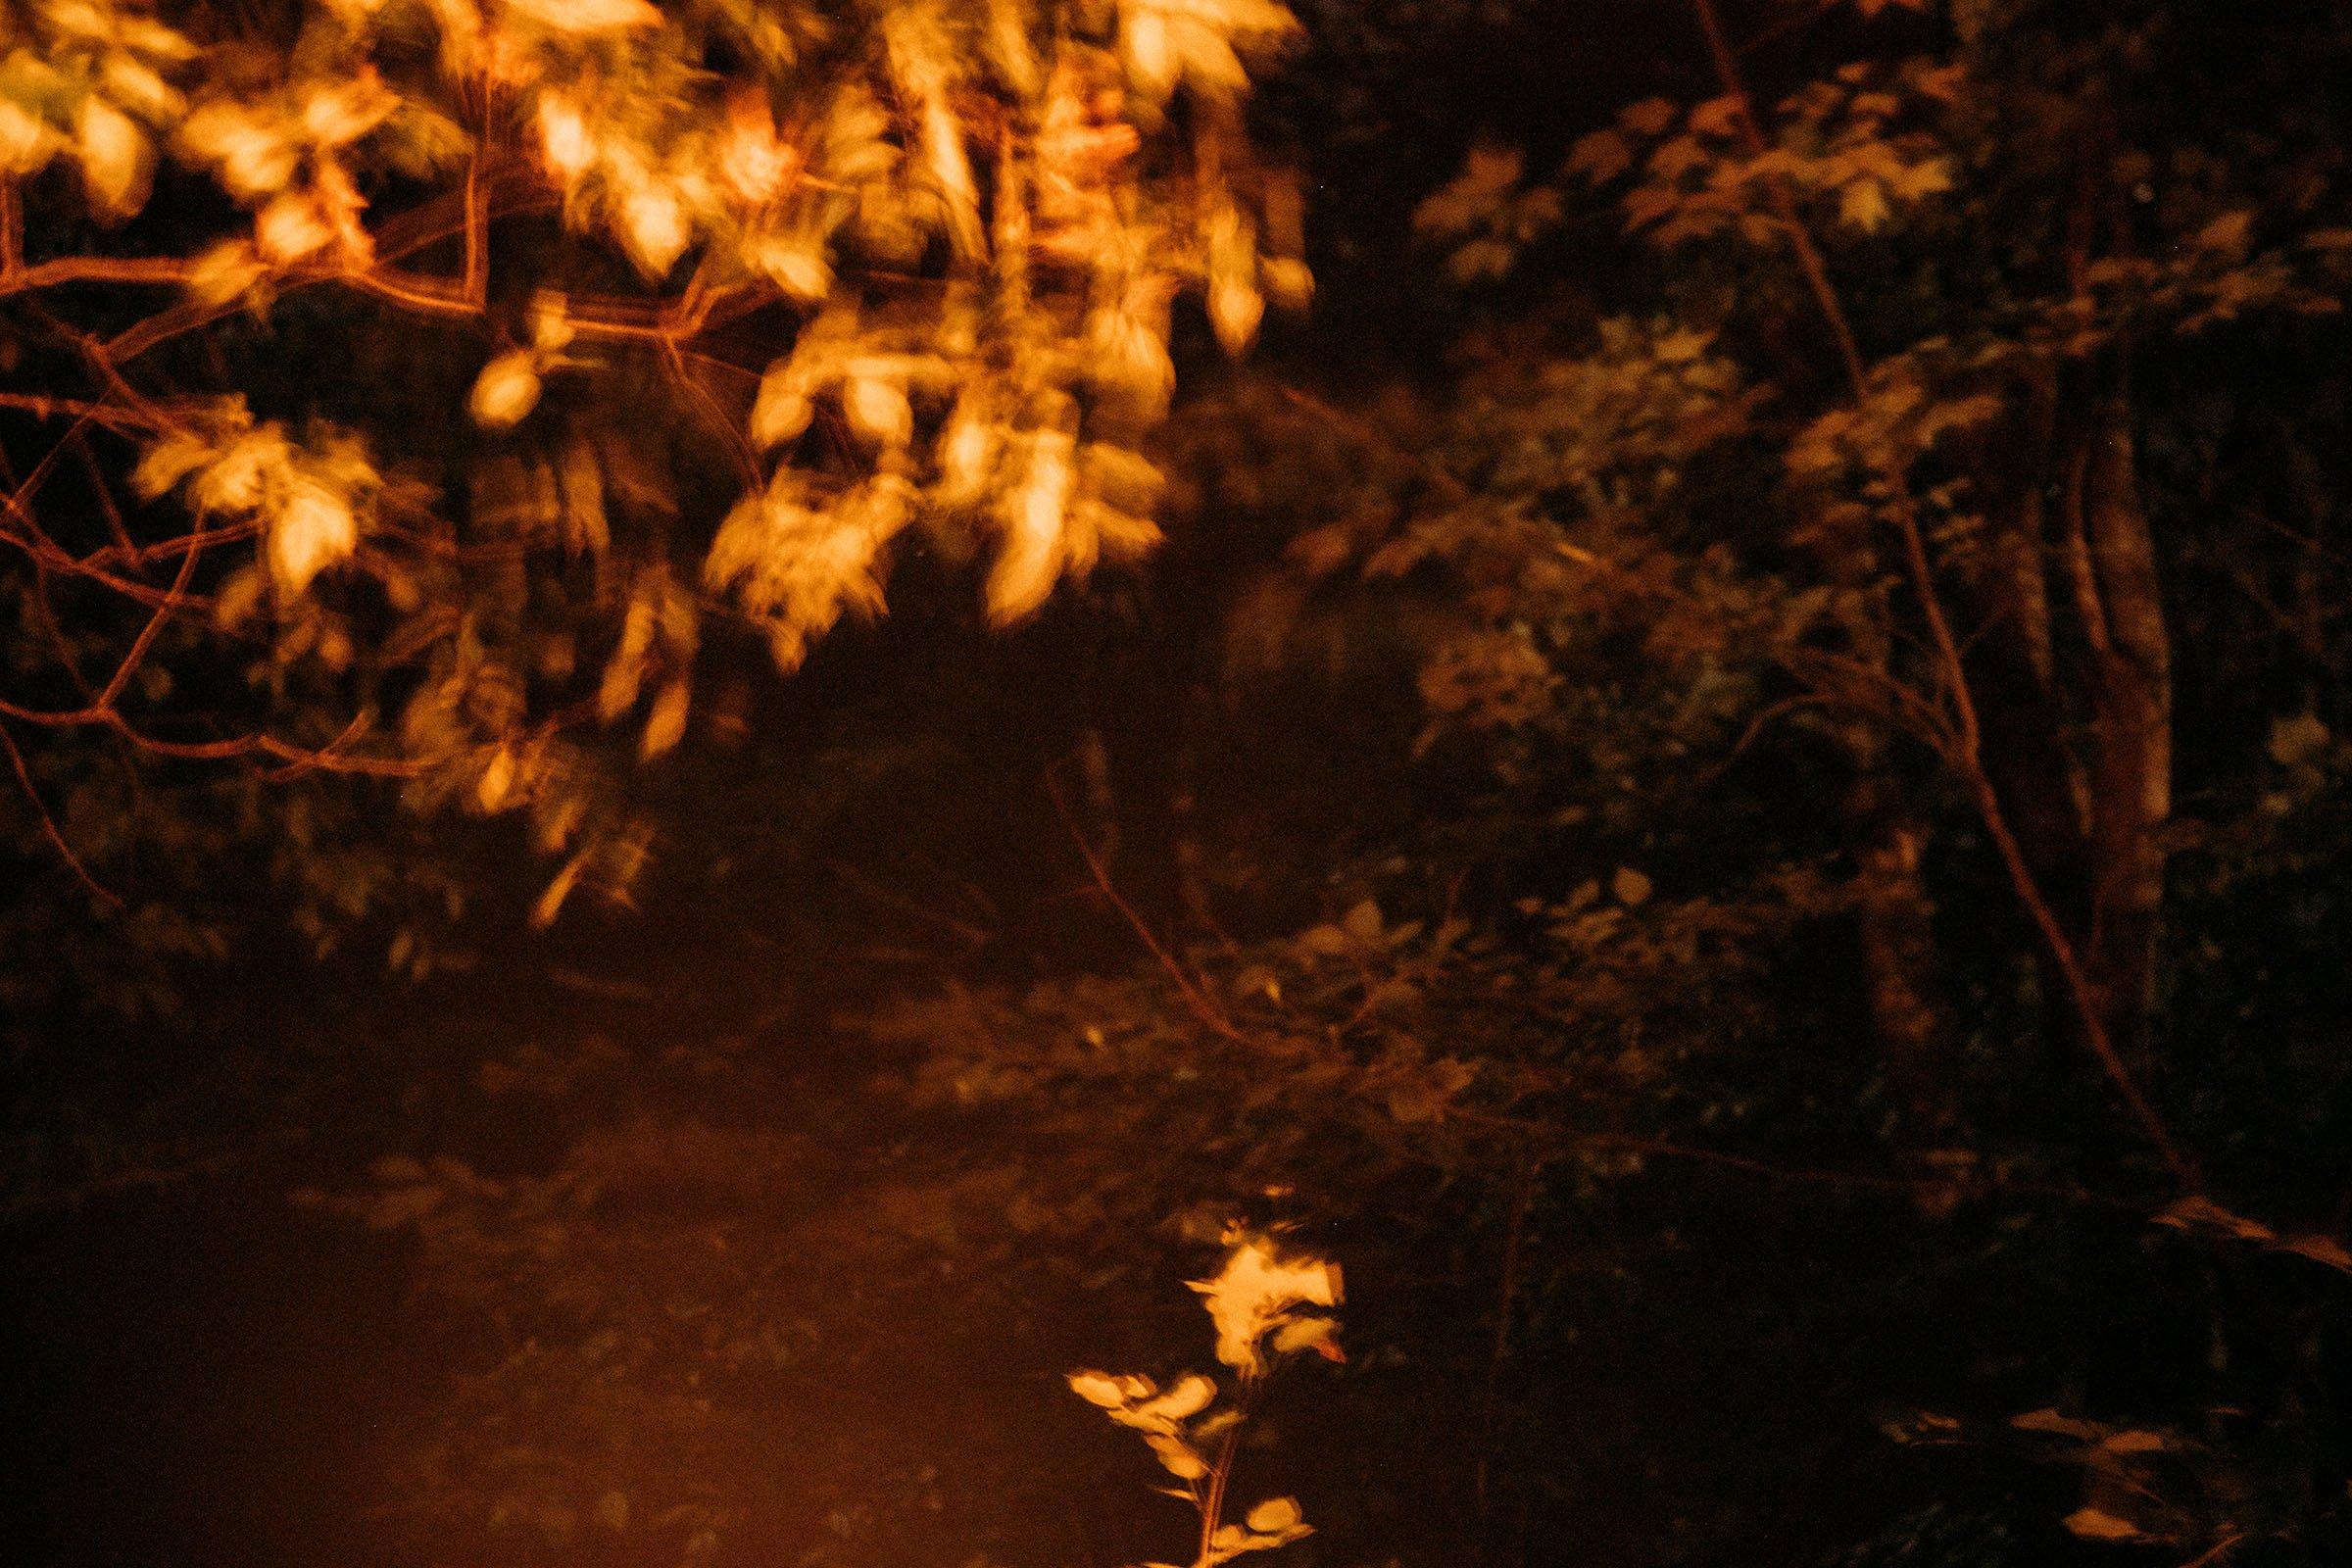 """Fire"", photograph by Melanie Gordon"